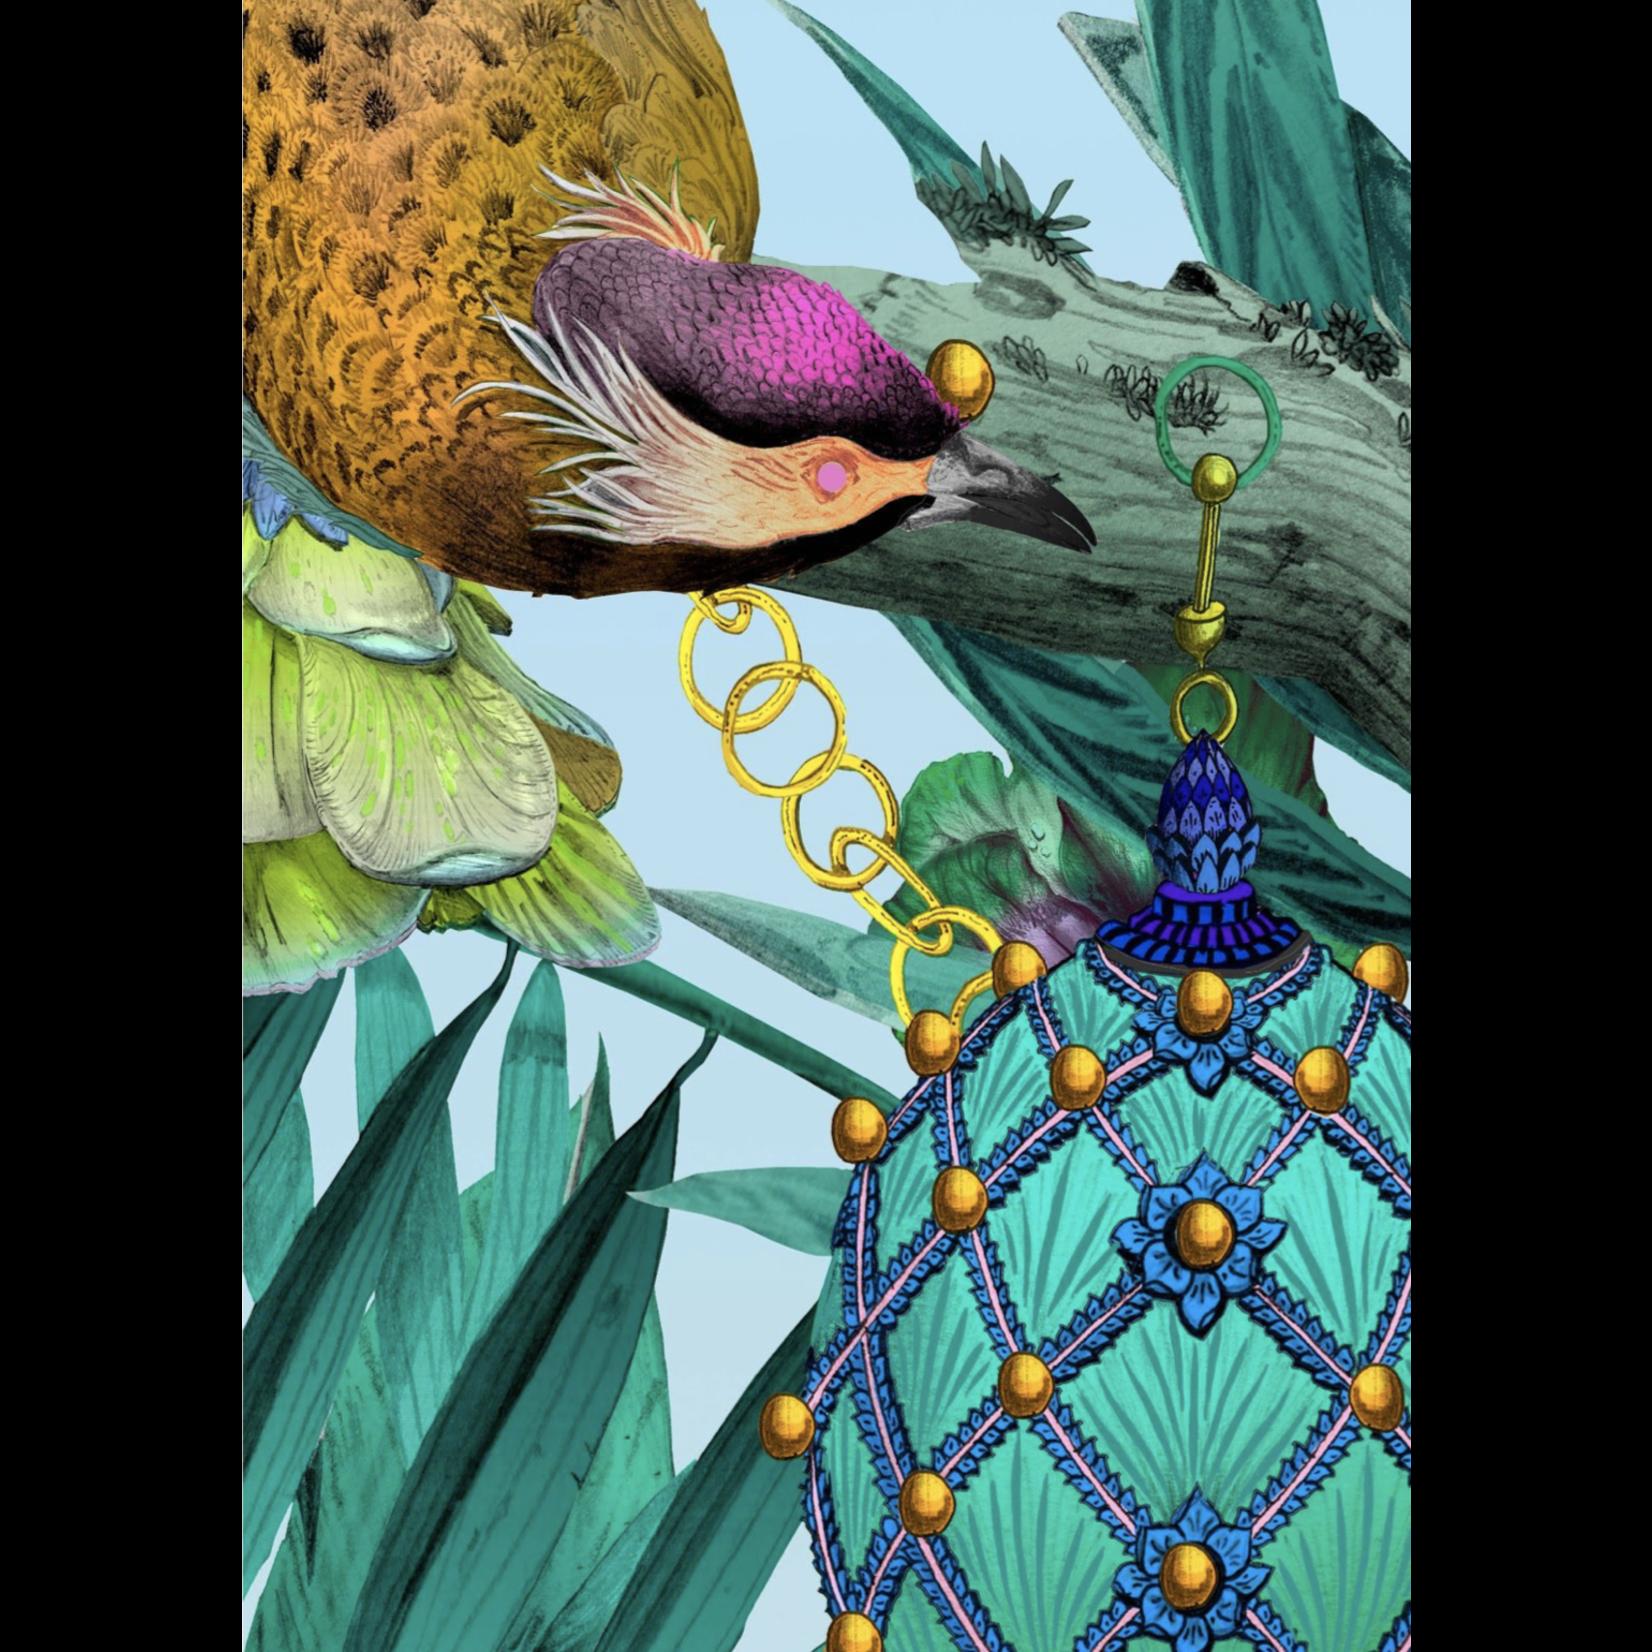 Kit Miles Ecclesiastical Botanica | Teal / Sky Blue